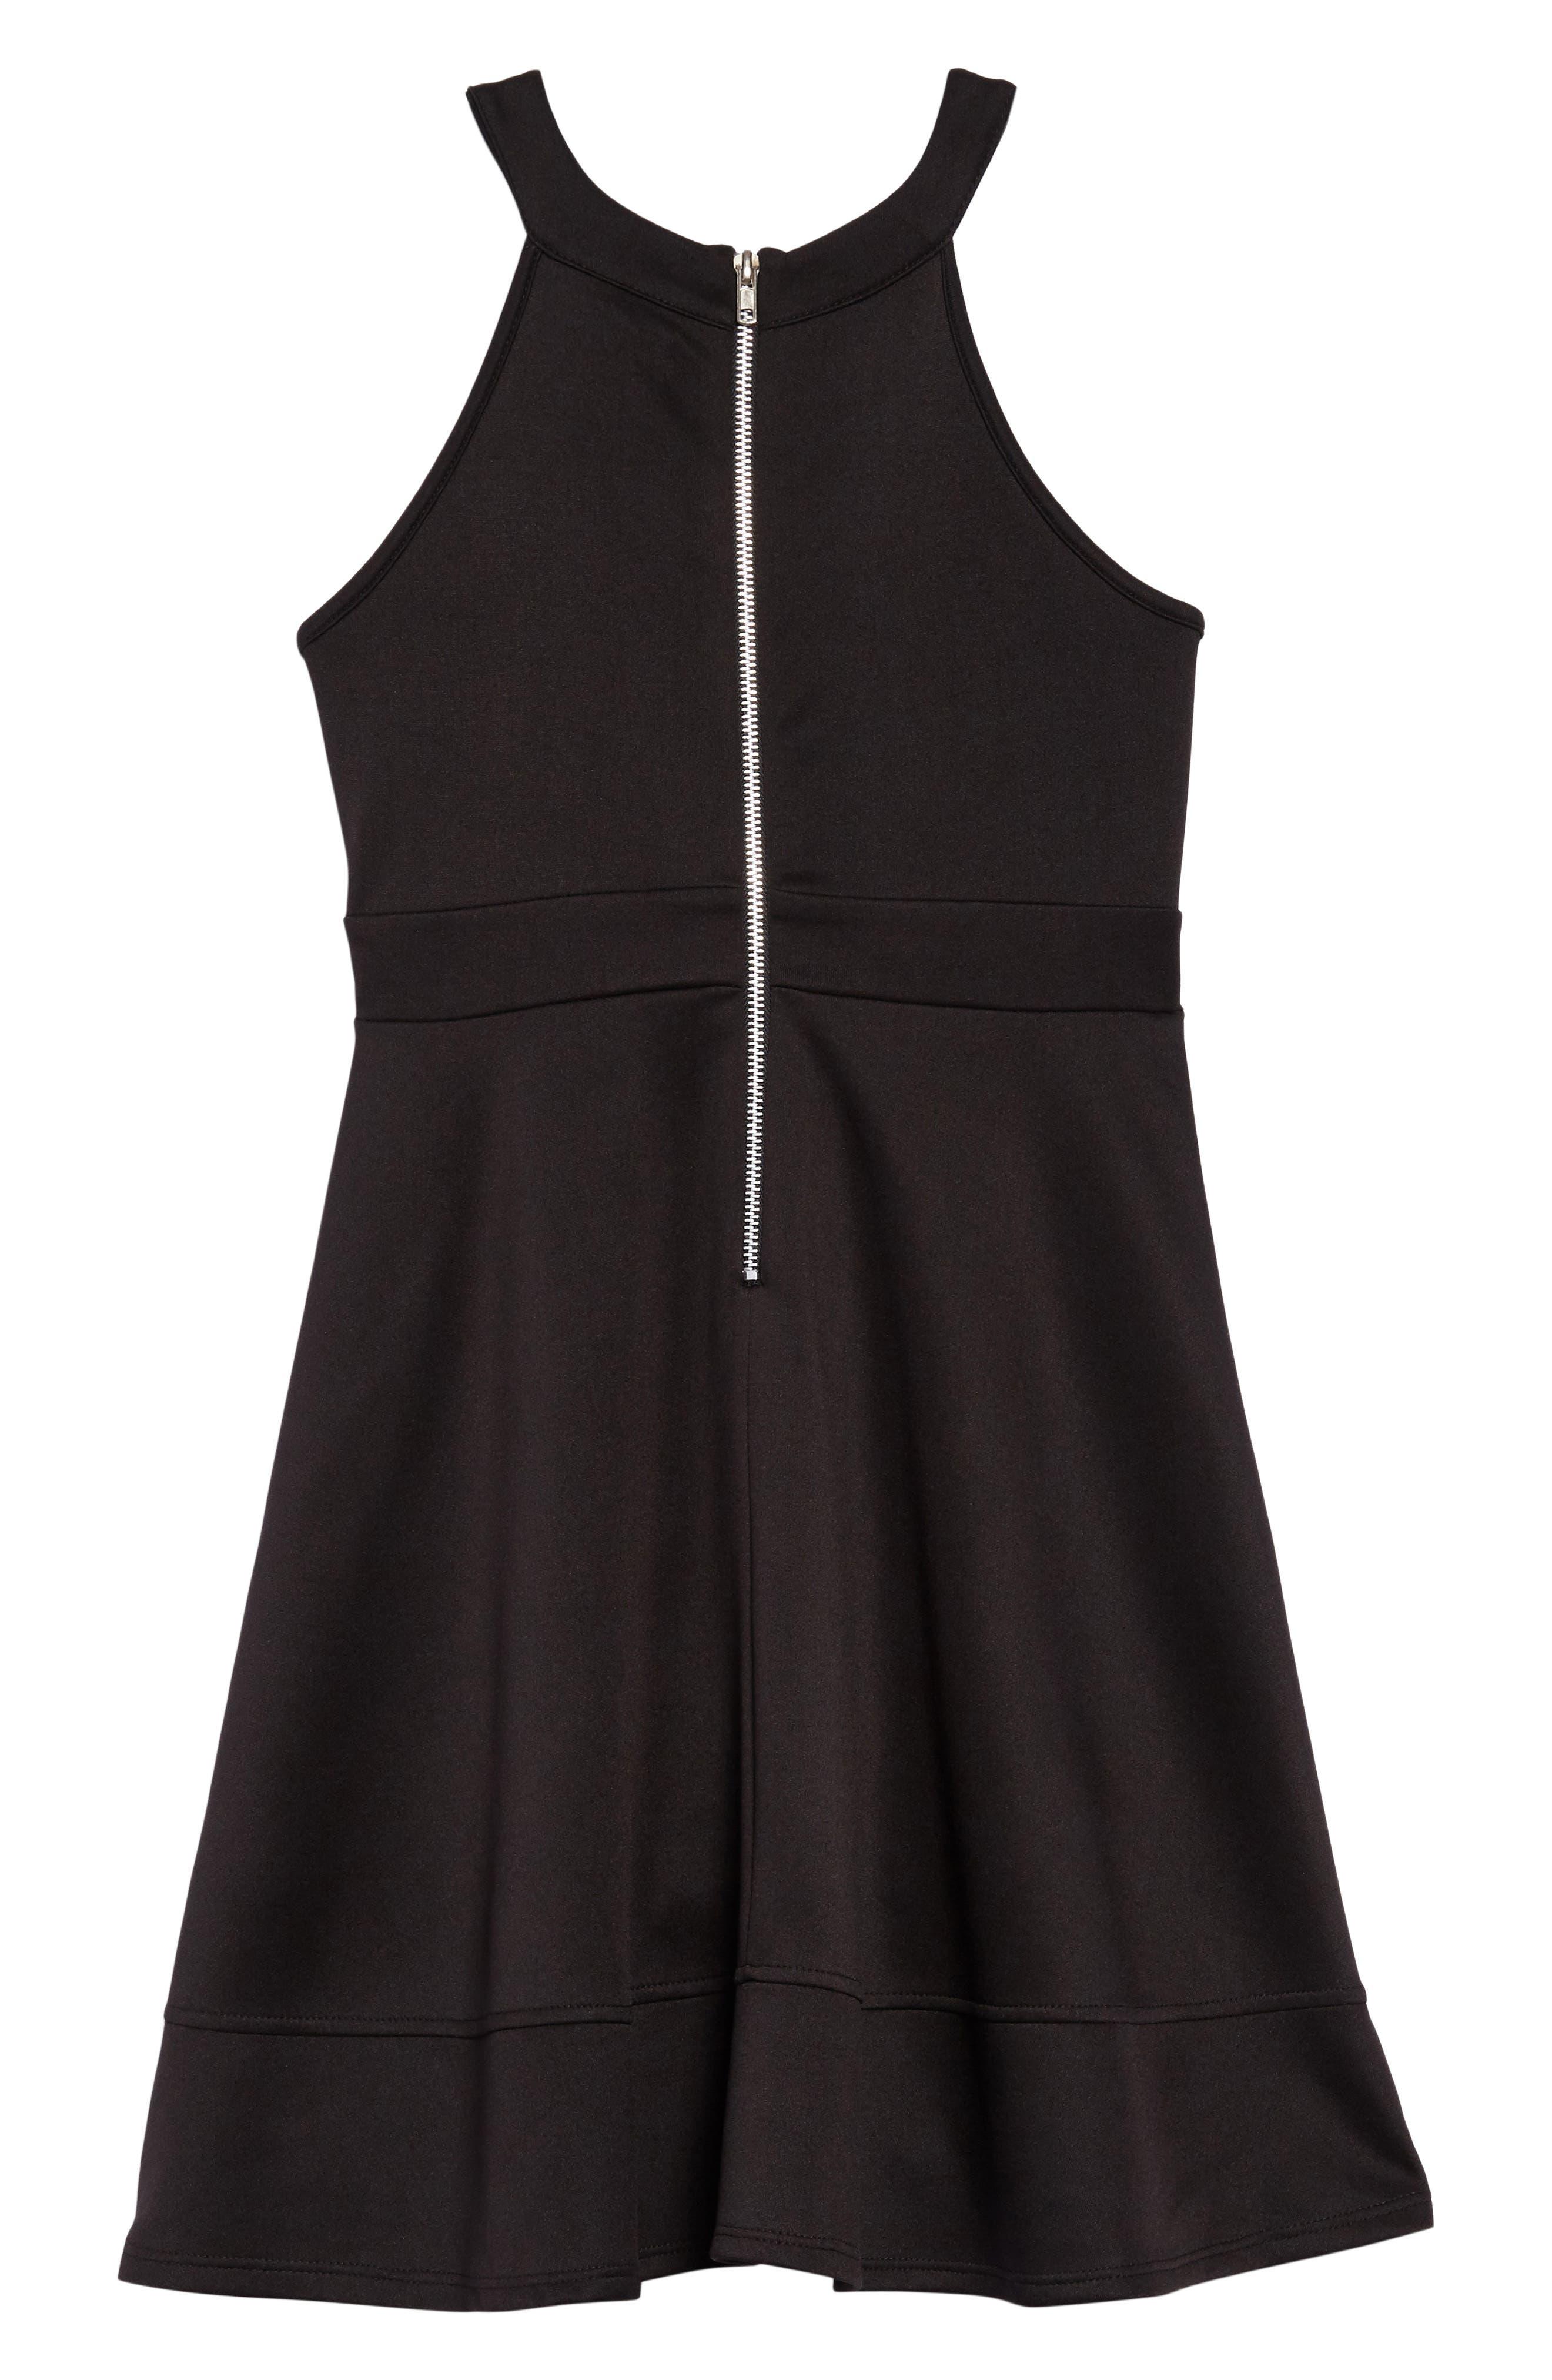 Illusion Neck Skater Dress,                             Alternate thumbnail 2, color,                             Black